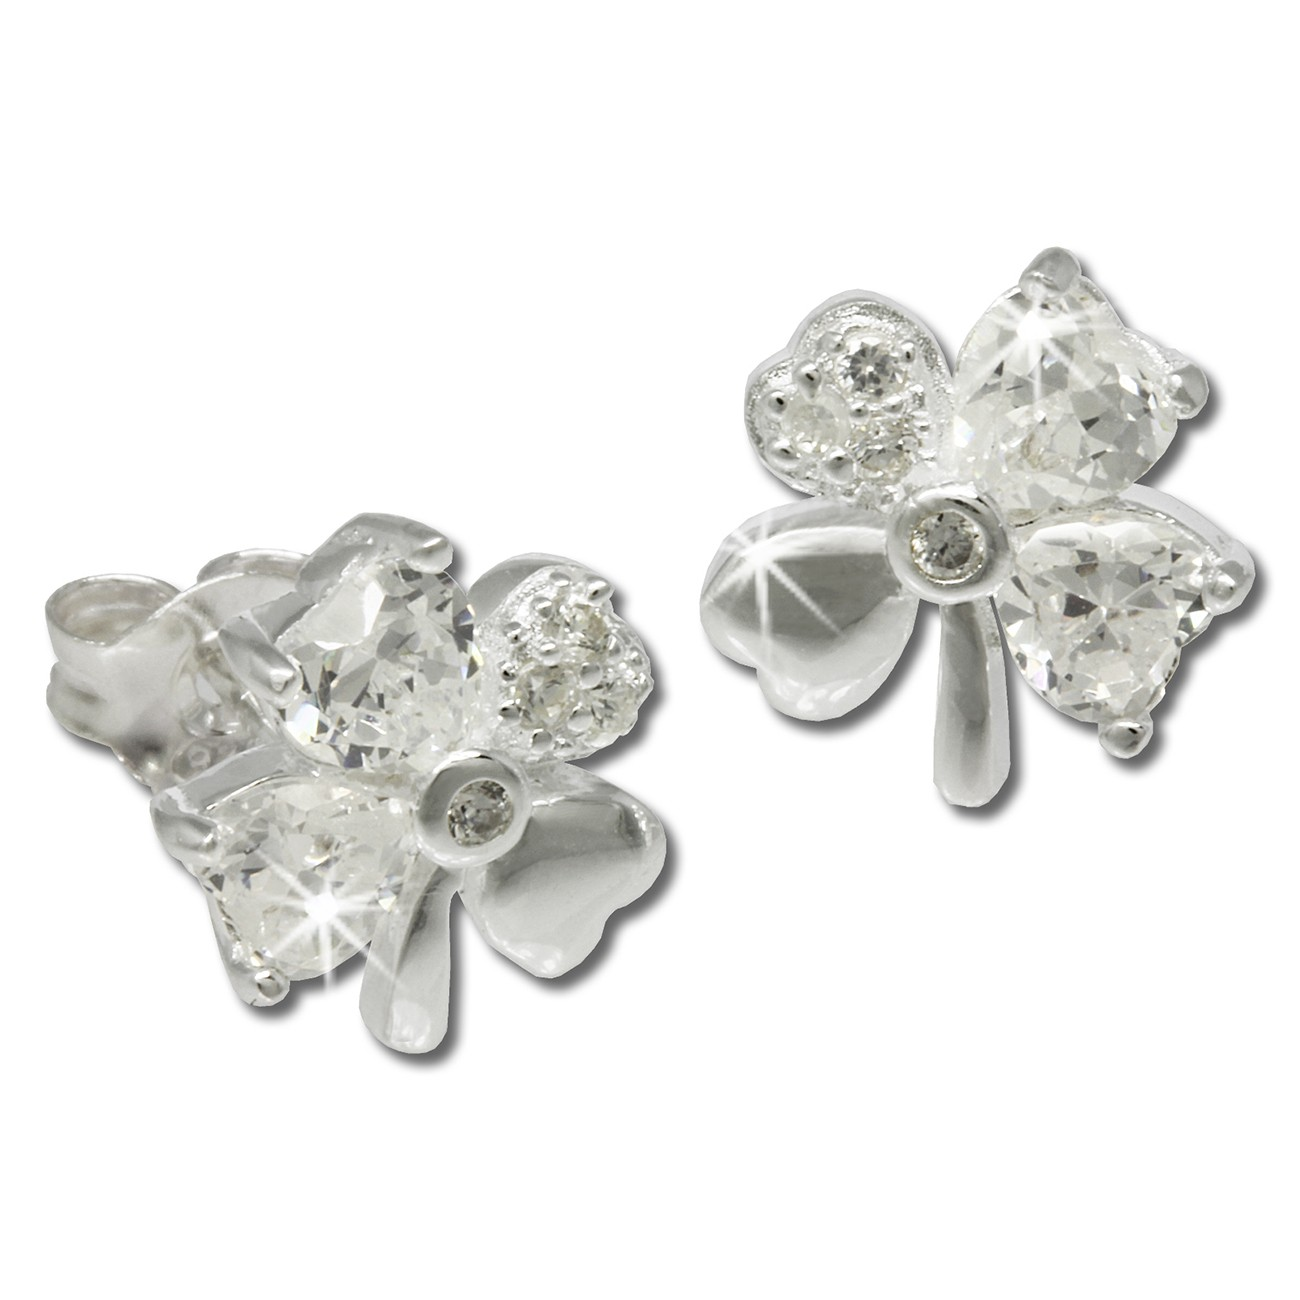 SilberDream Ohrstecker Kleeblatt weiße Zirkonia Silber Ohrringe SDO790W